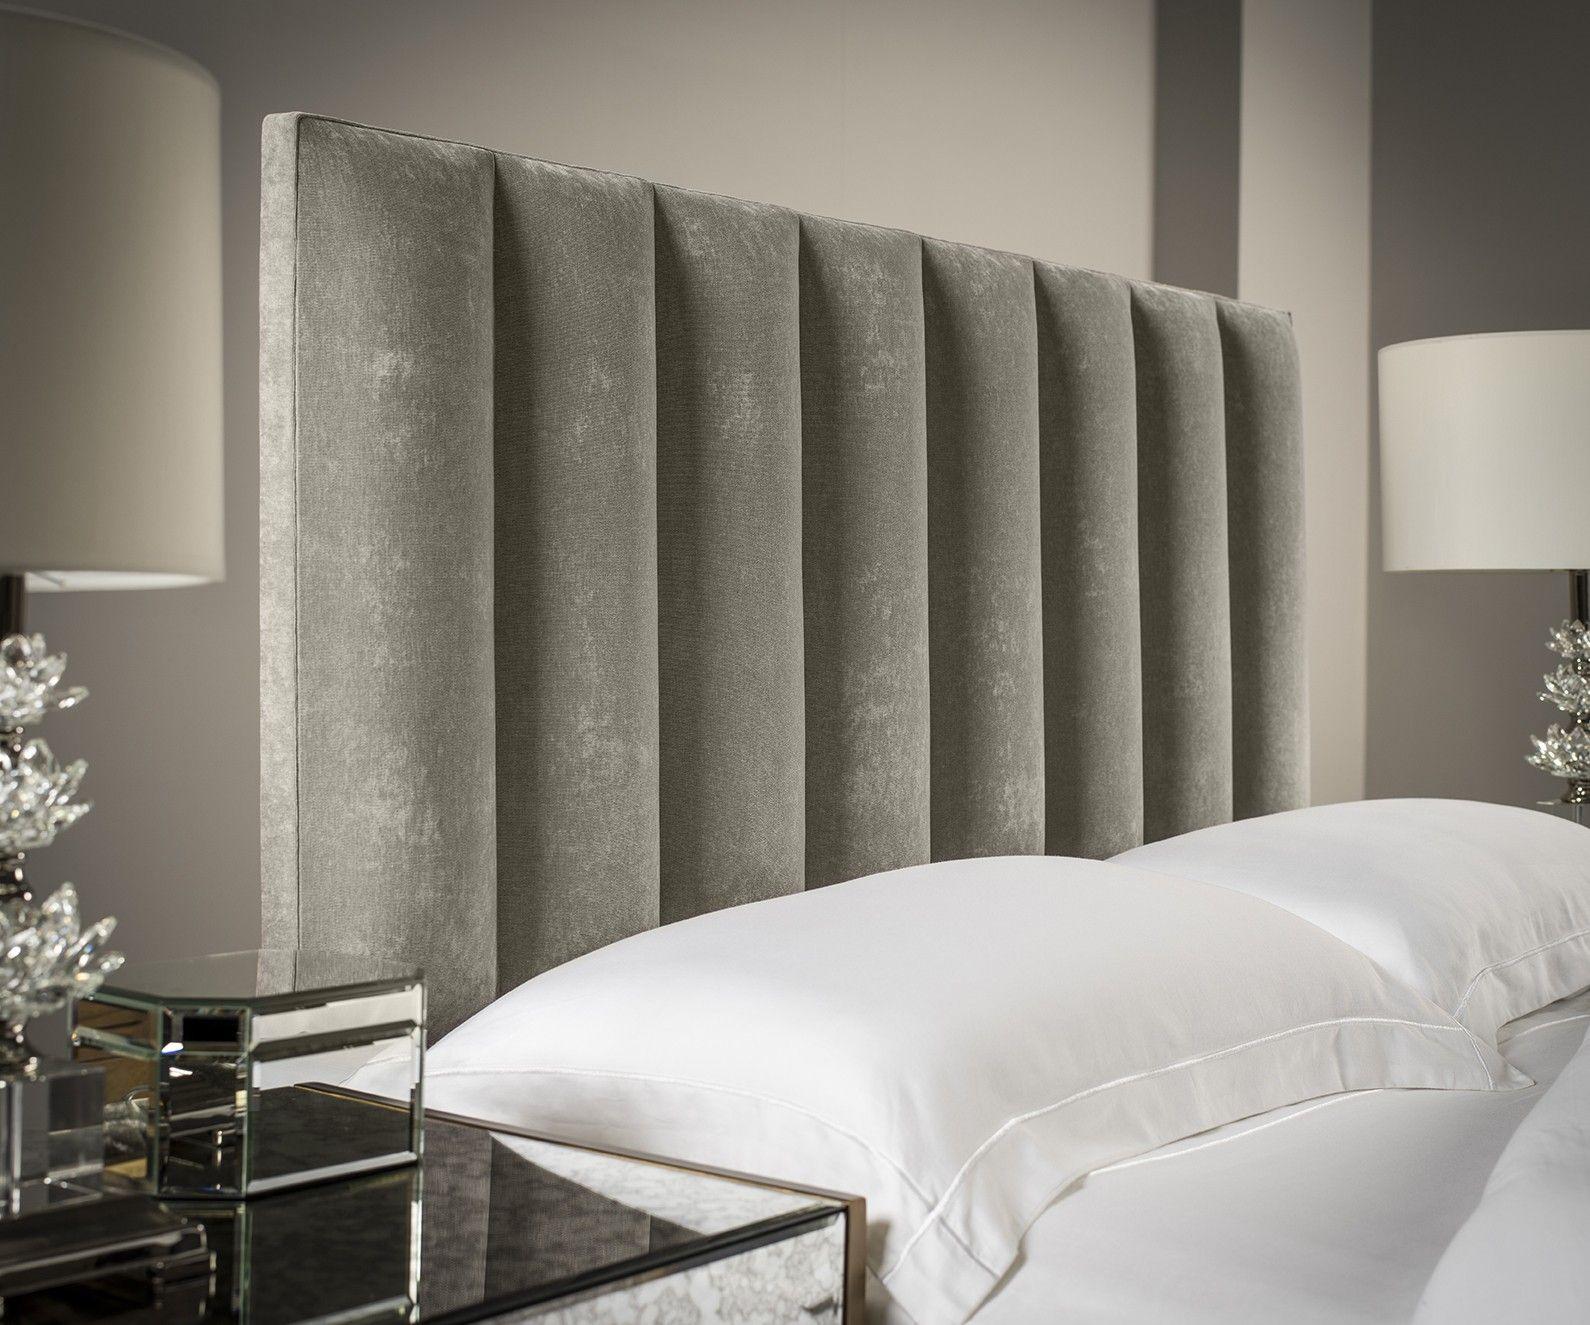 Tubes Vertical Upholstered Headboard in 2020 Bed